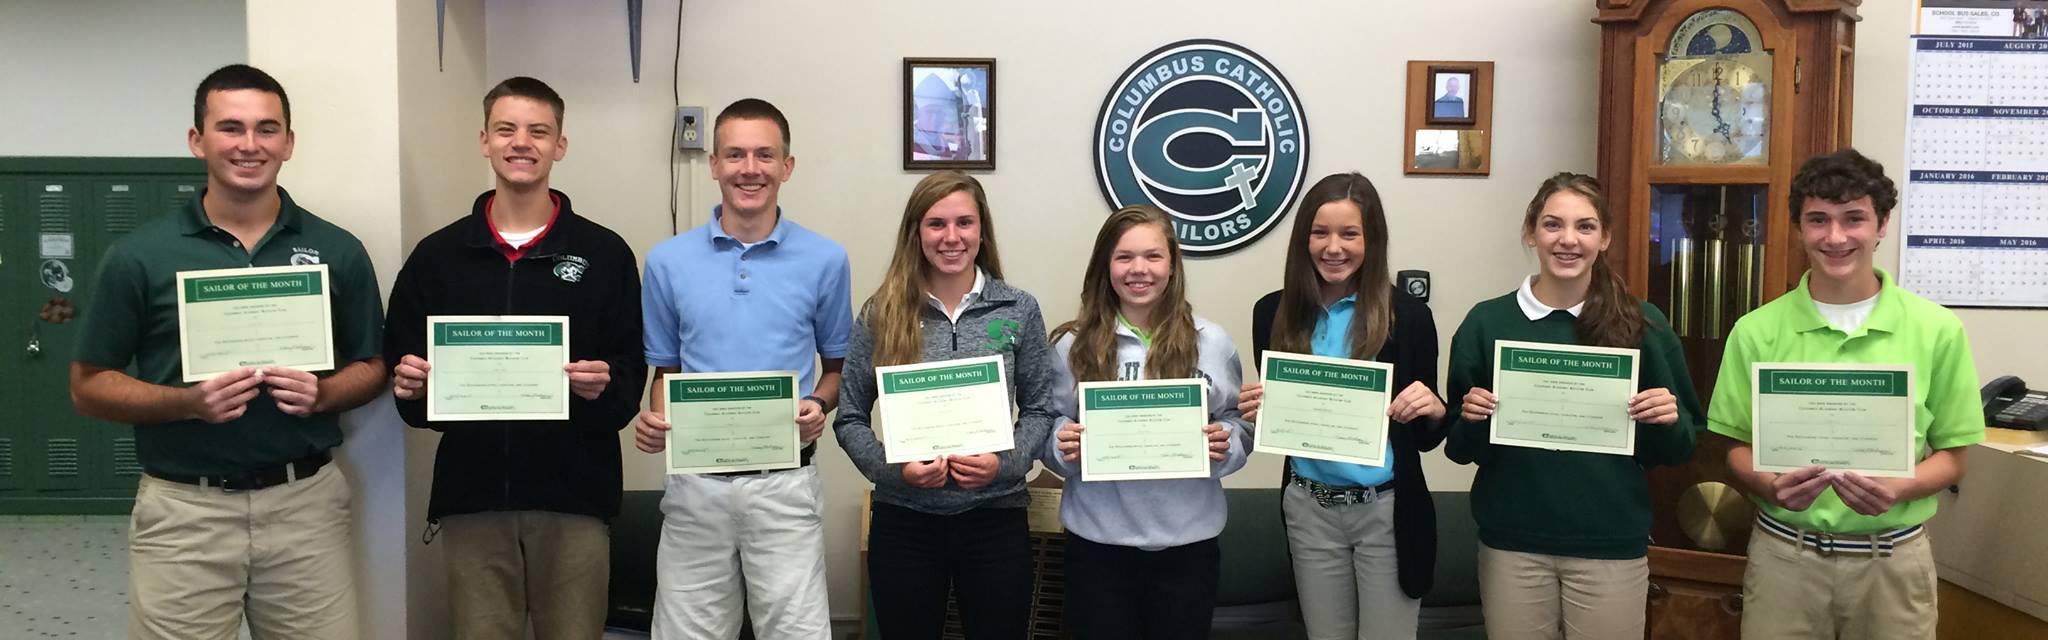 ColumbusCatholic-PrivateDay-Iowa-USA-Studentsandcertificates